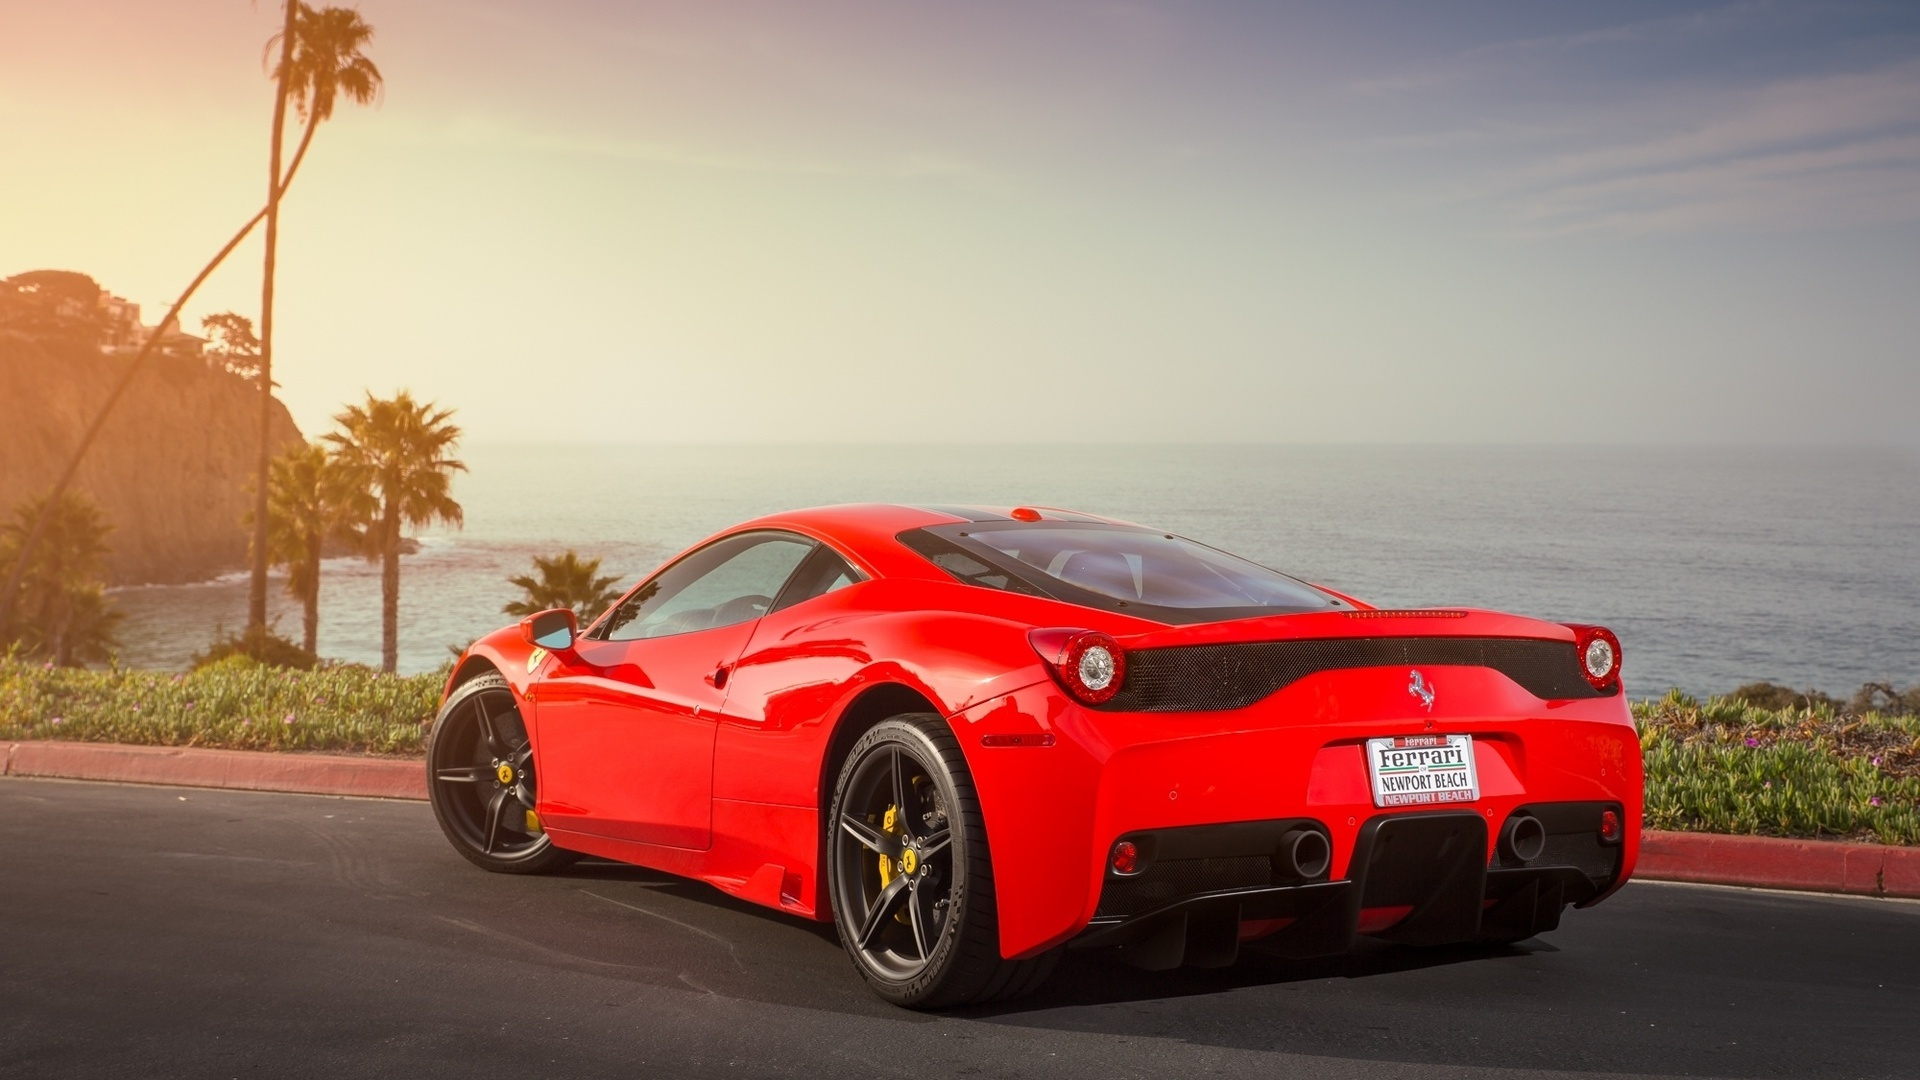 Ferrari 458 Italia wallpaper 30186 1920x1080